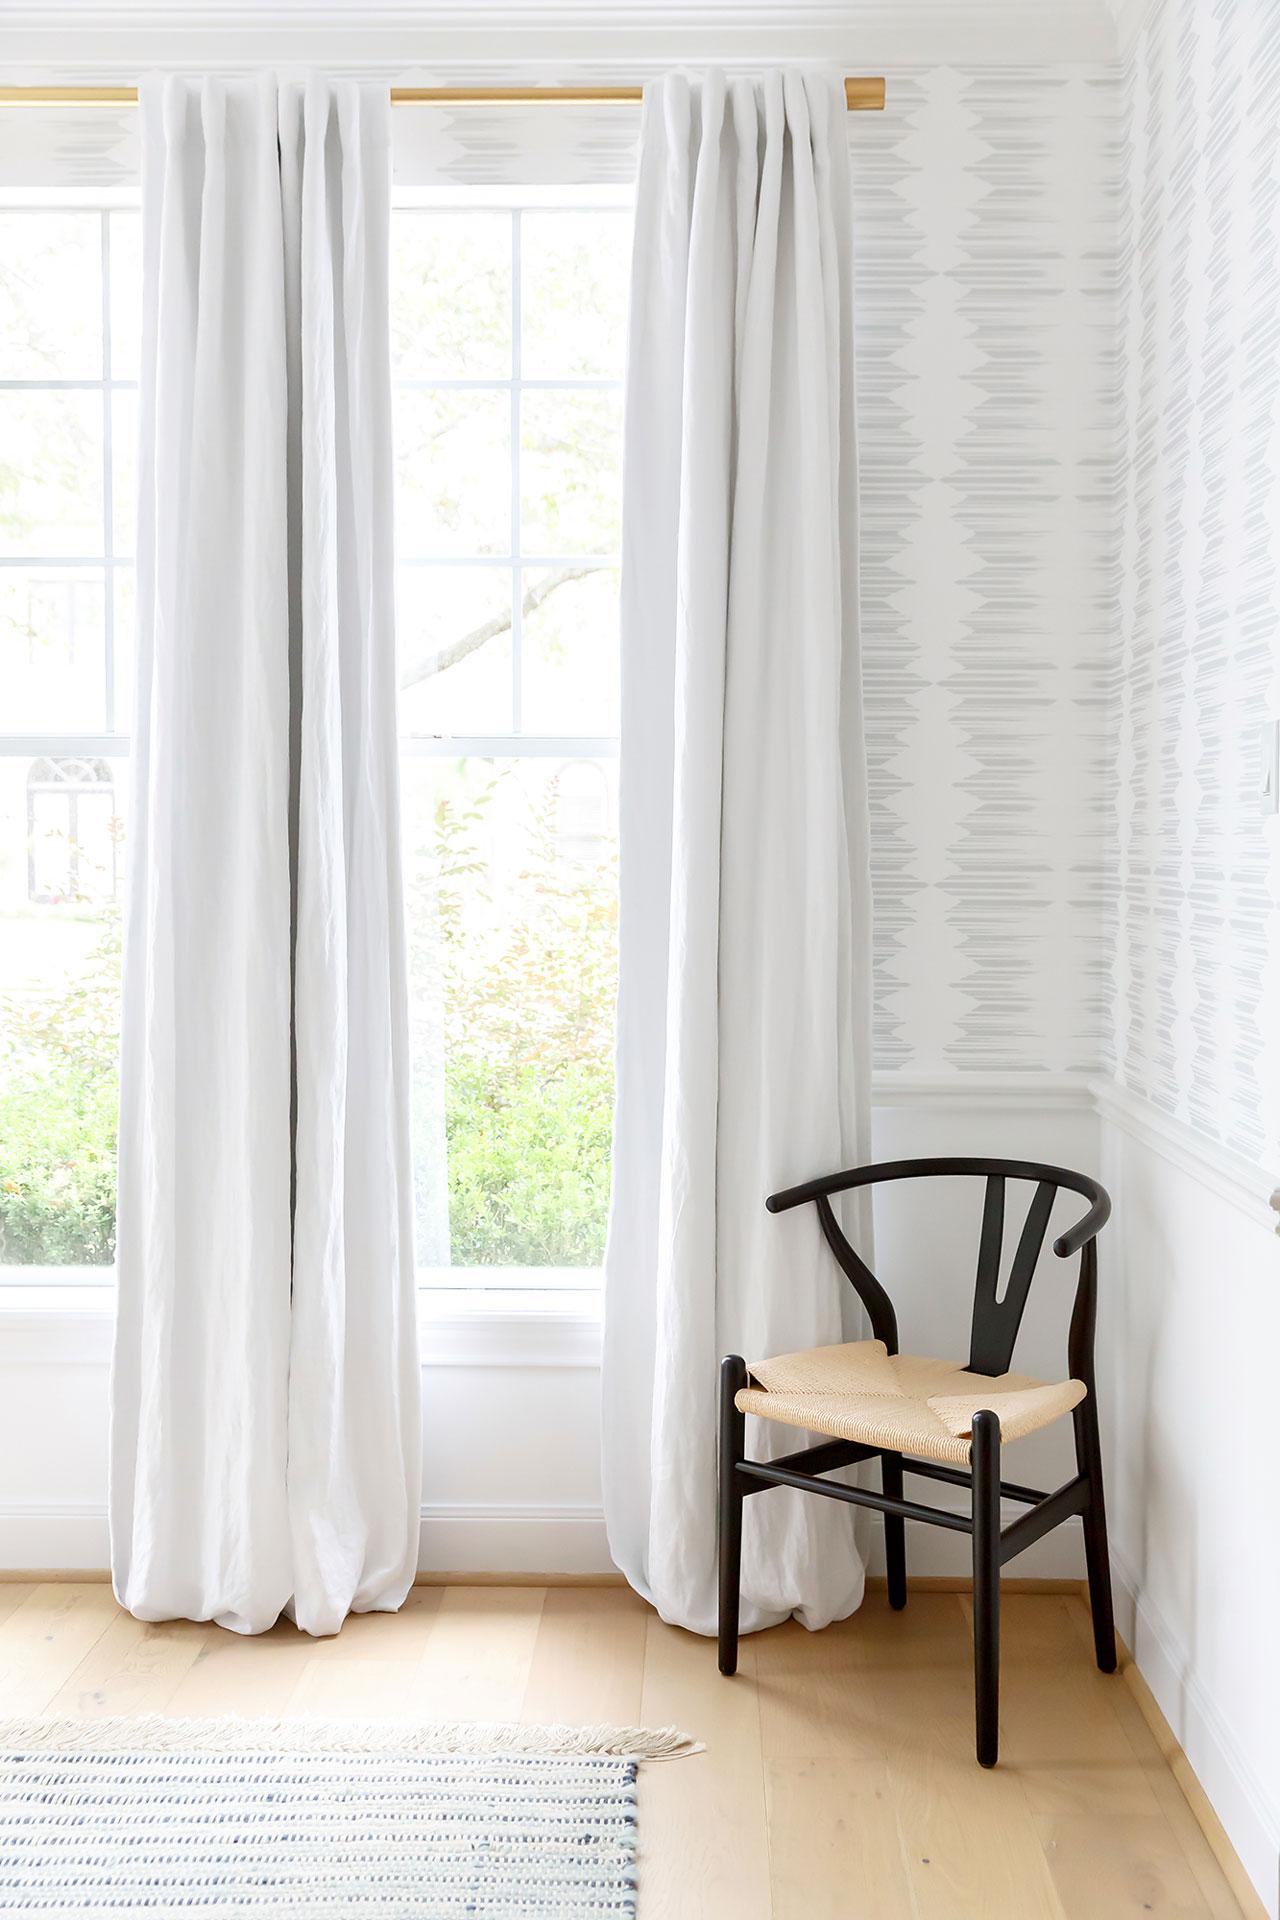 CUSTOM STONE TEXTILE TRIBAL FRINGE Designer: Stone Textile